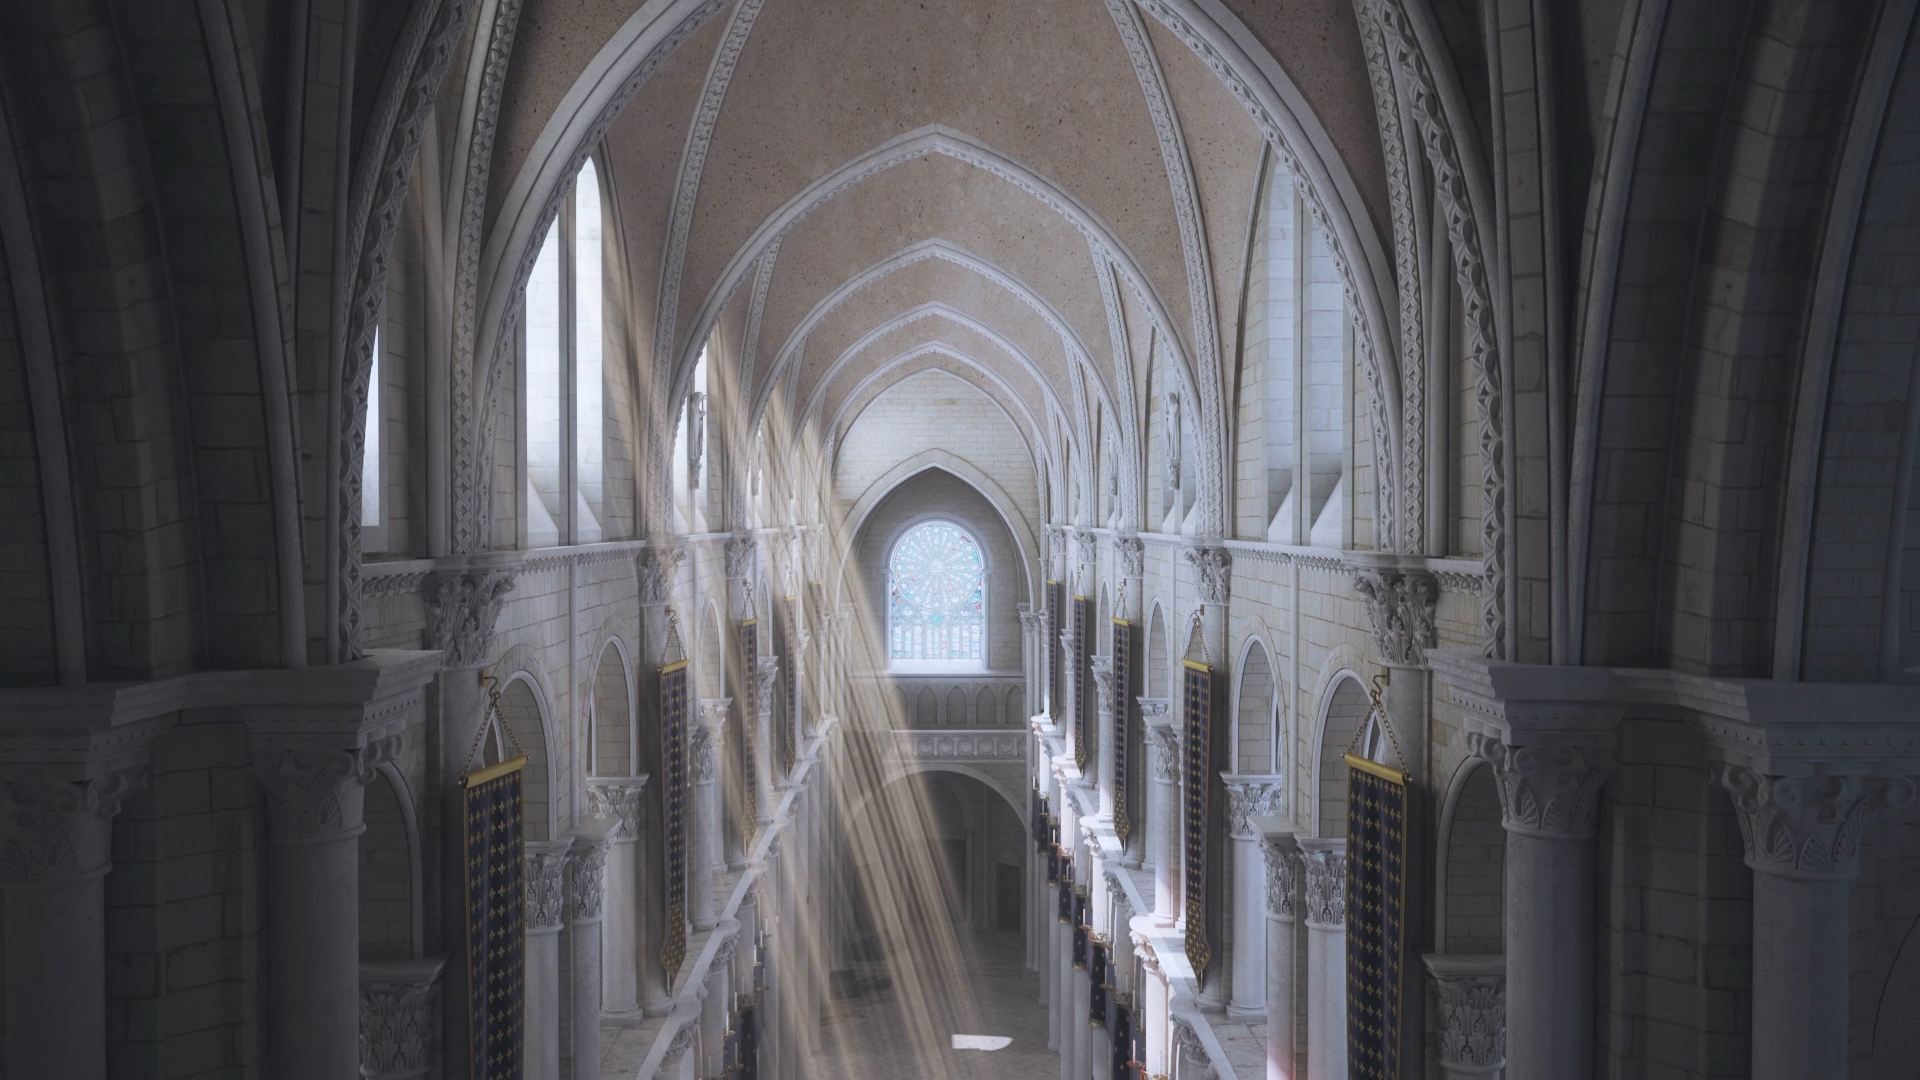 GALERIE-Dripmoon-Studio 3D-Tours-Reconstitution-Patrimoine-REVIS MARTIN (51) copie